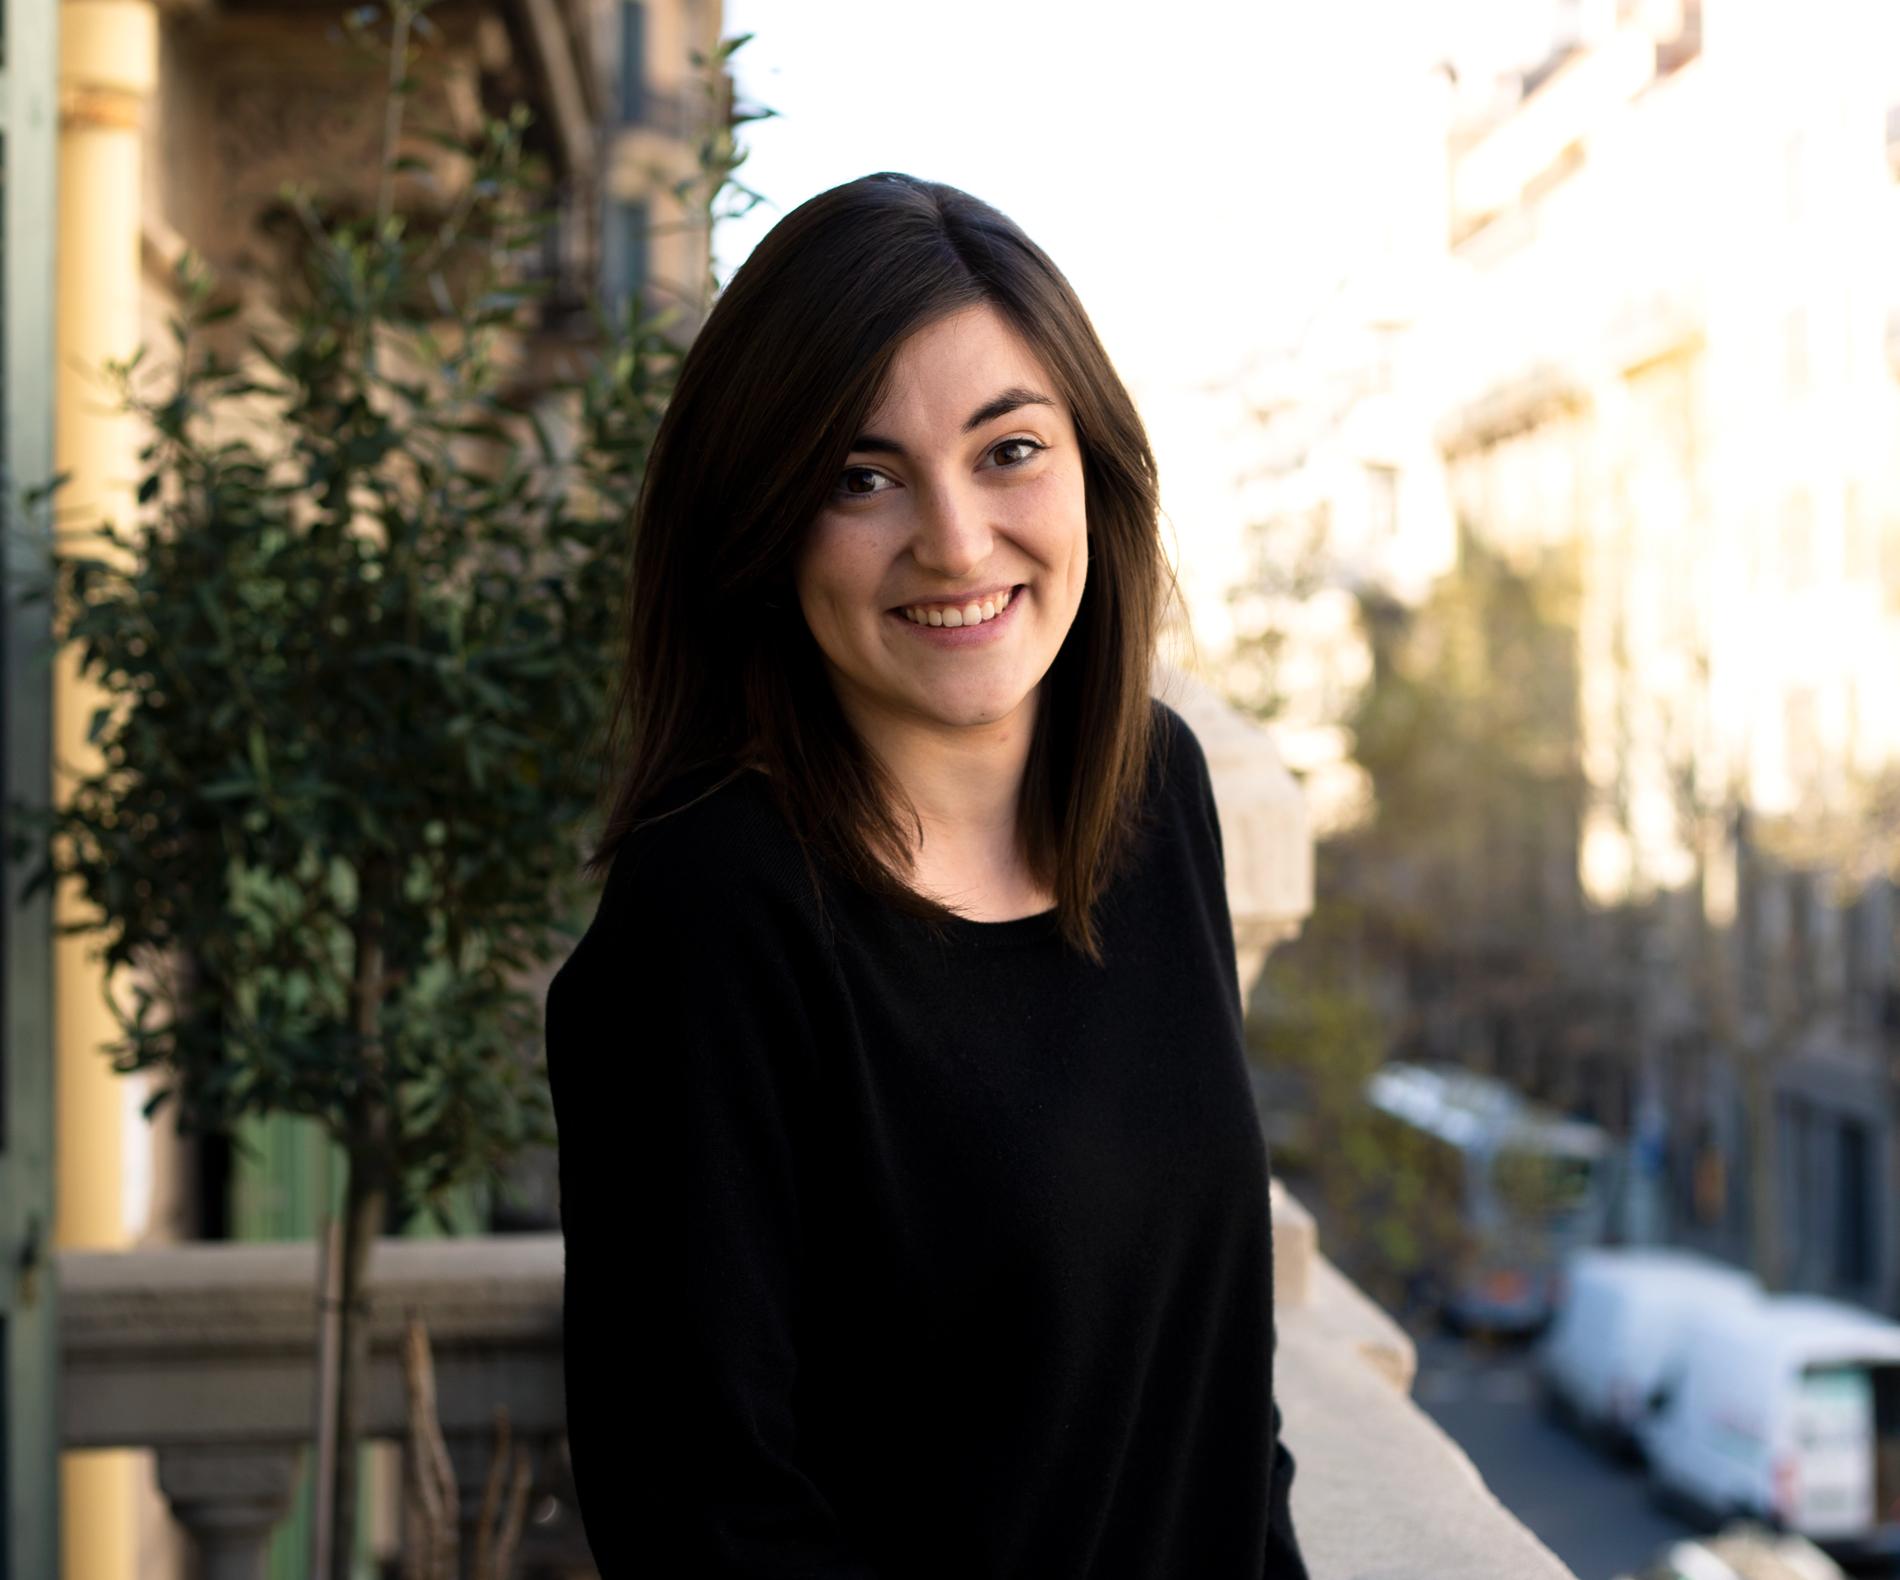 Anna Martorell Sanchez